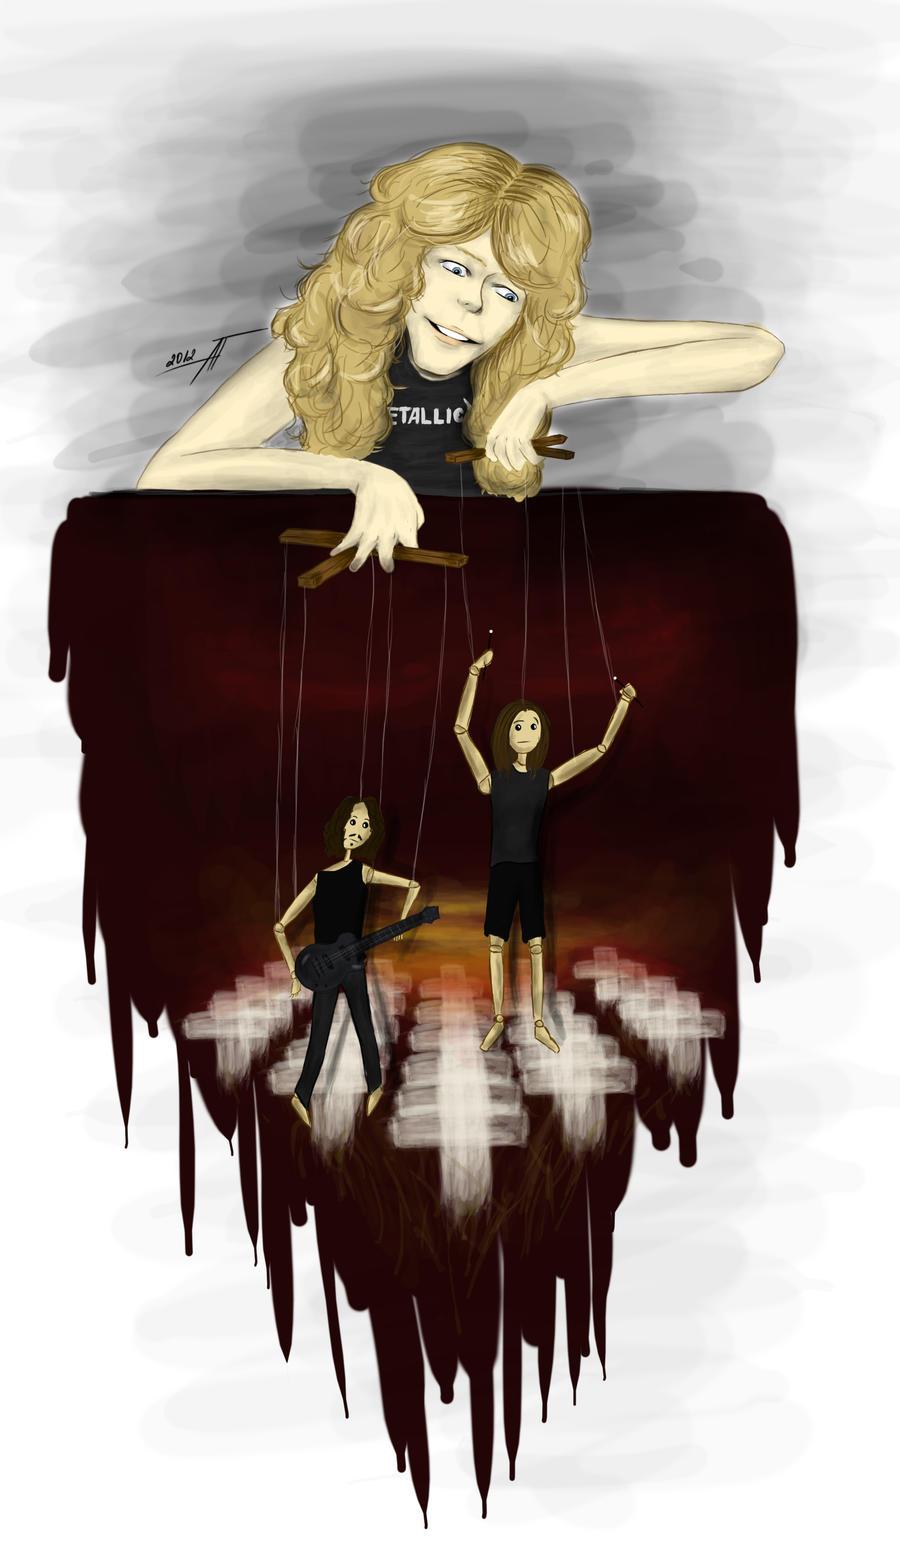 Master Of Puppets By AnastasiumArtdeviantart On DeviantArt